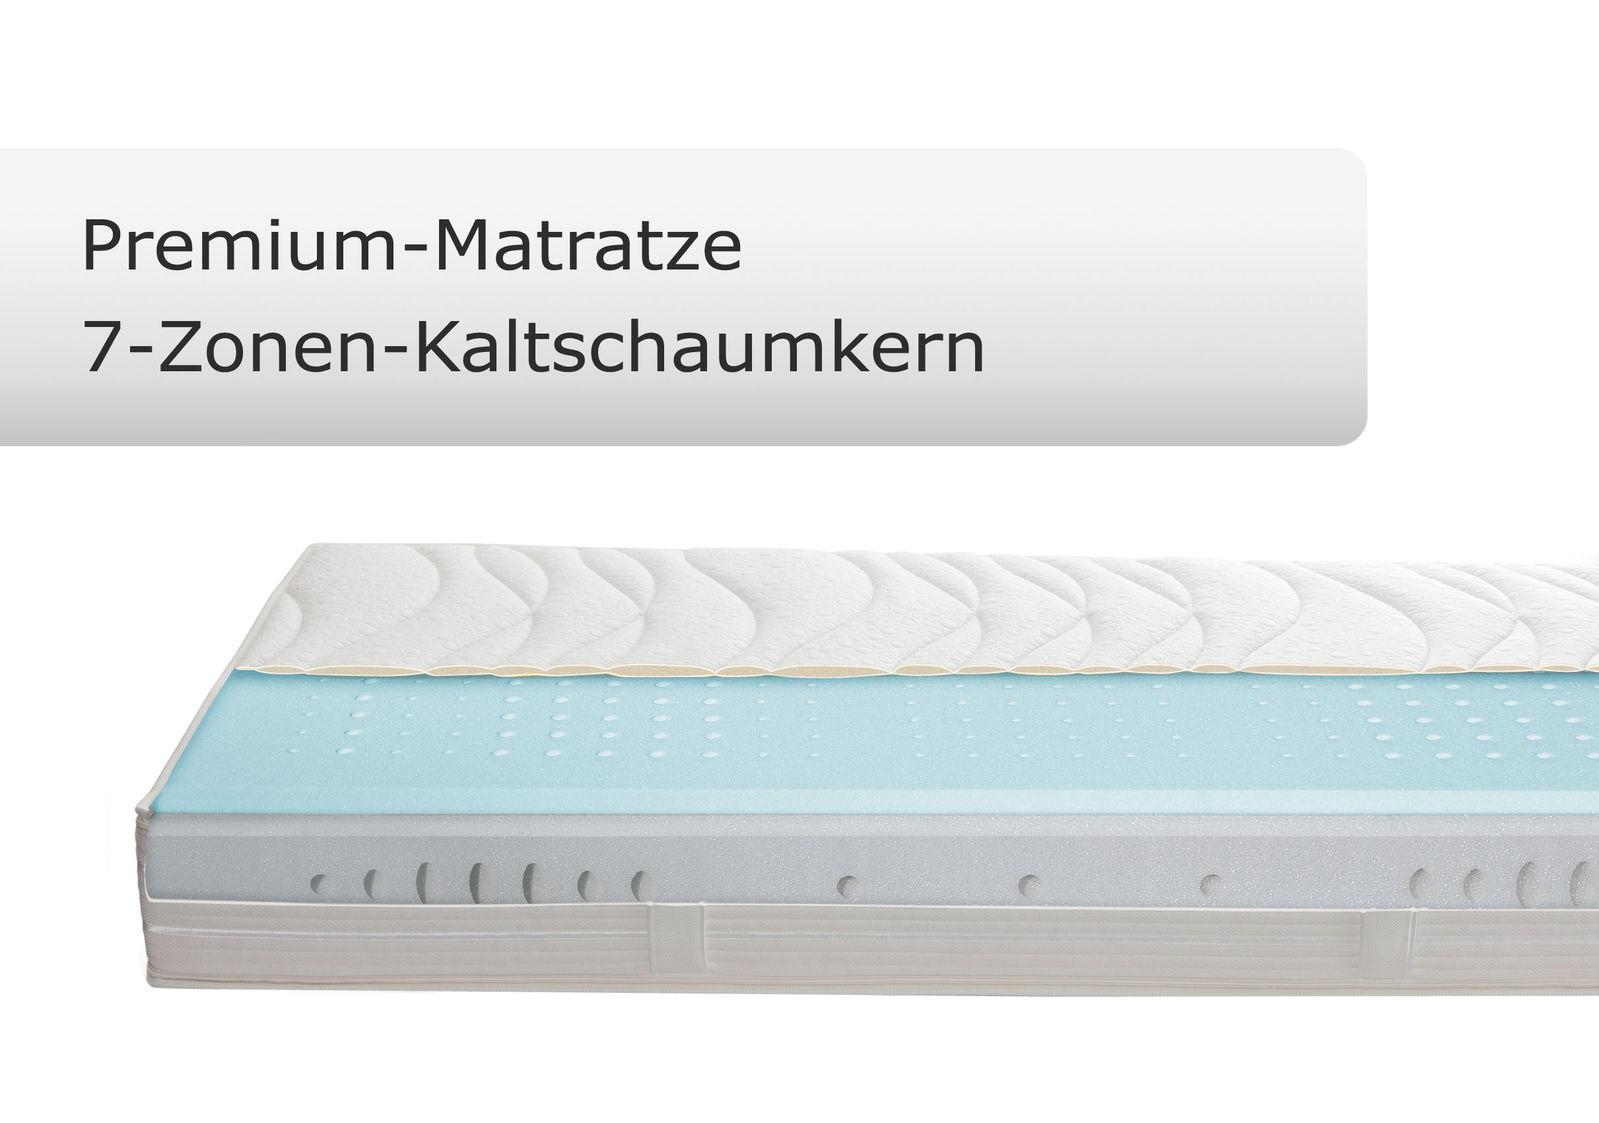 boxspringbett mit waschbarem matratzenbezug kunstleder. Black Bedroom Furniture Sets. Home Design Ideas